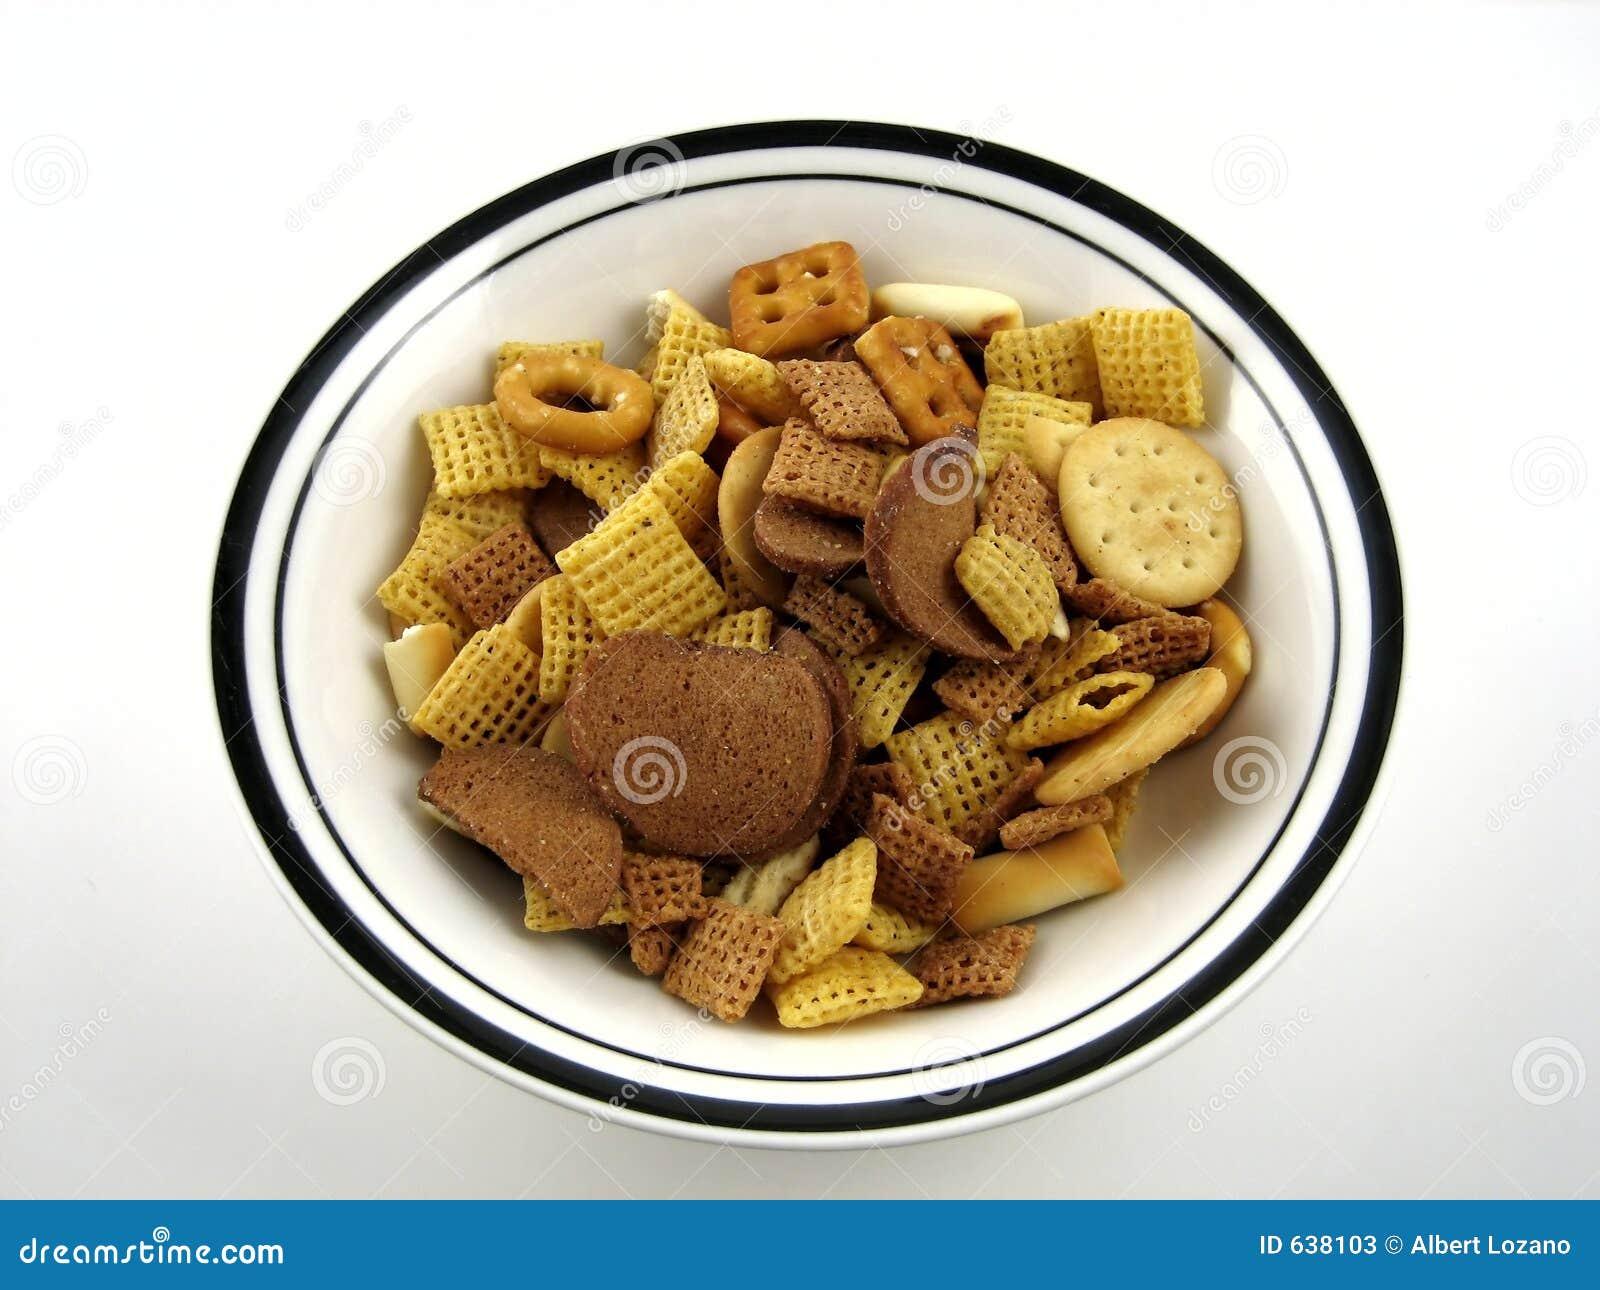 Download еда стоковое изображение. изображение насчитывающей свободно - 638103